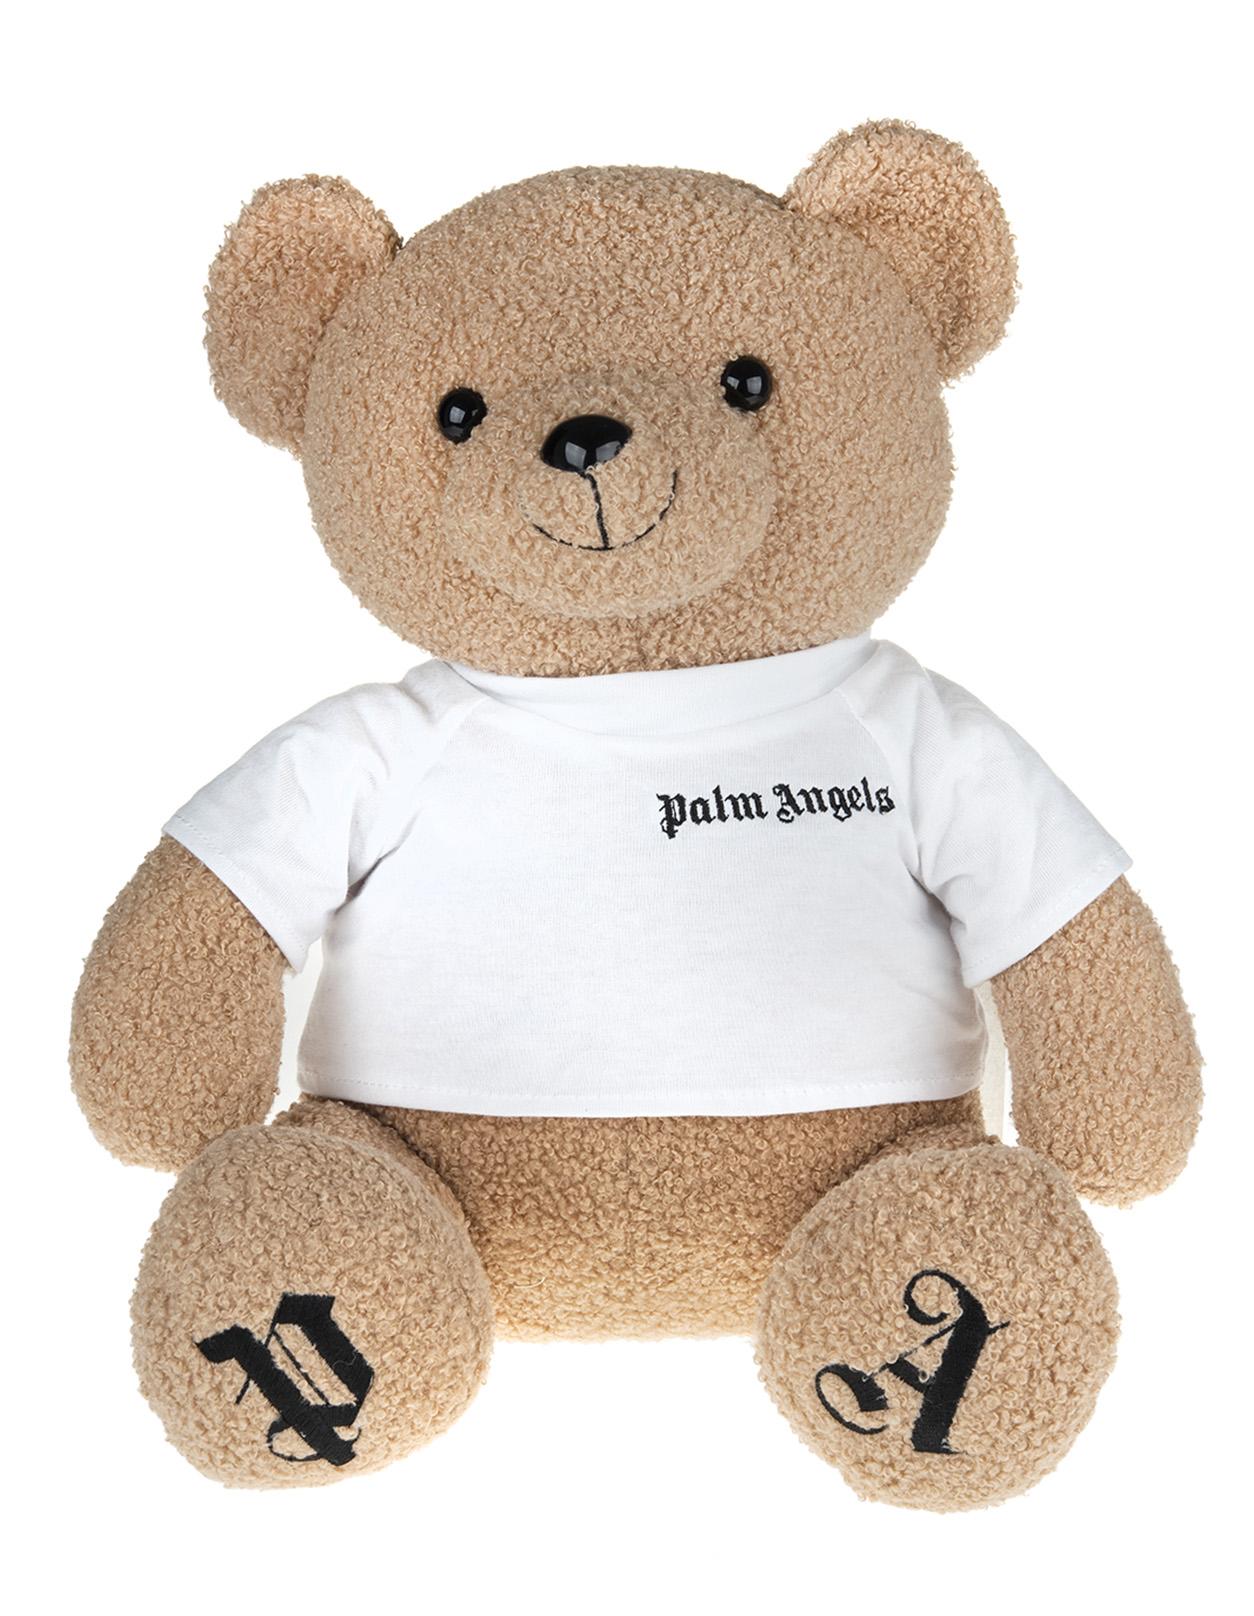 PALM ANGELS Mini Bear Peluche With White Logo T-Shirt